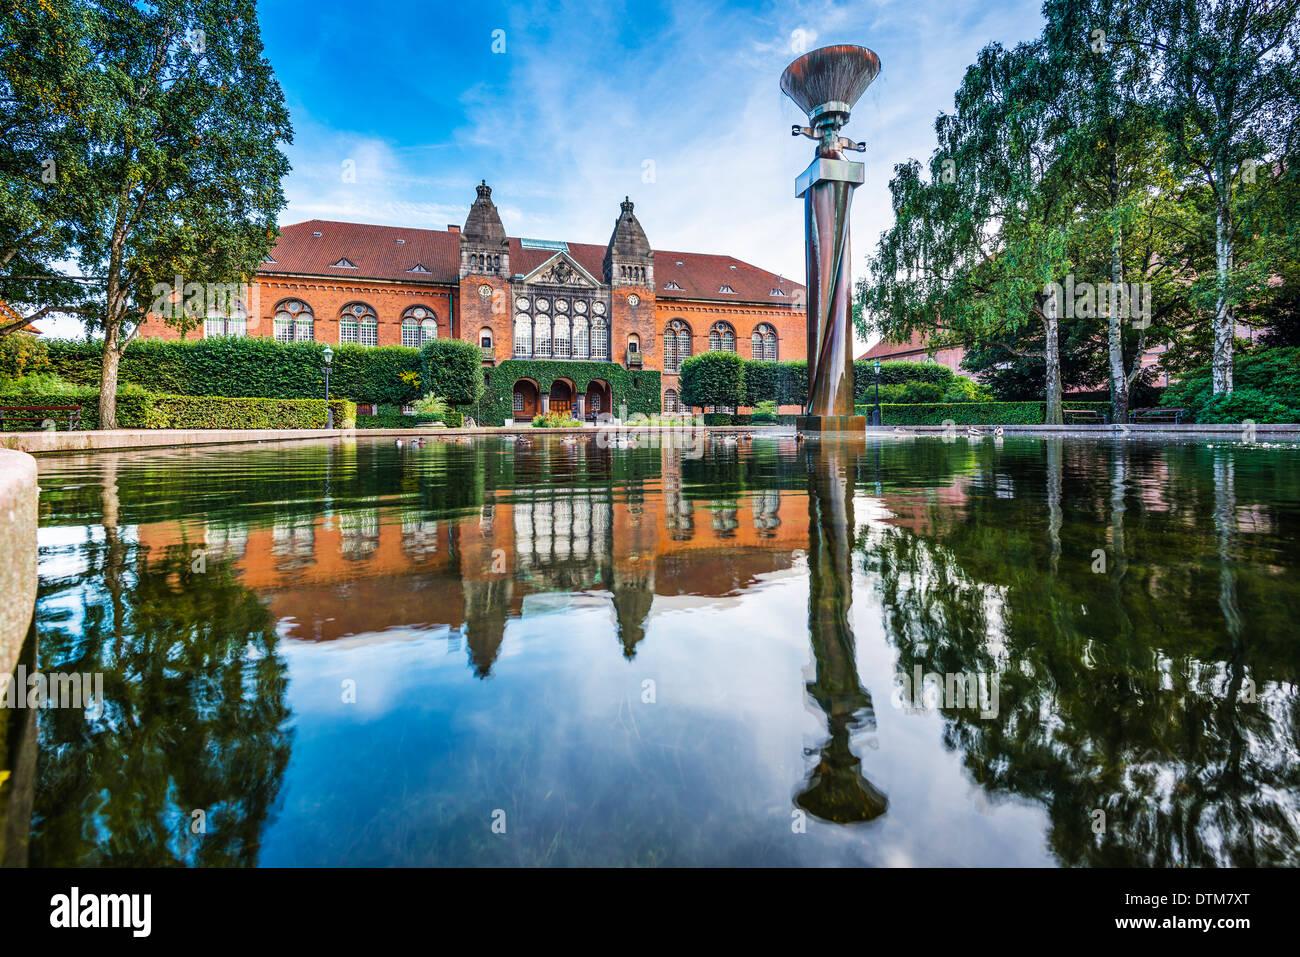 Museo Judío de Dinamarca en Copenhague, Dinamarca. Foto de stock